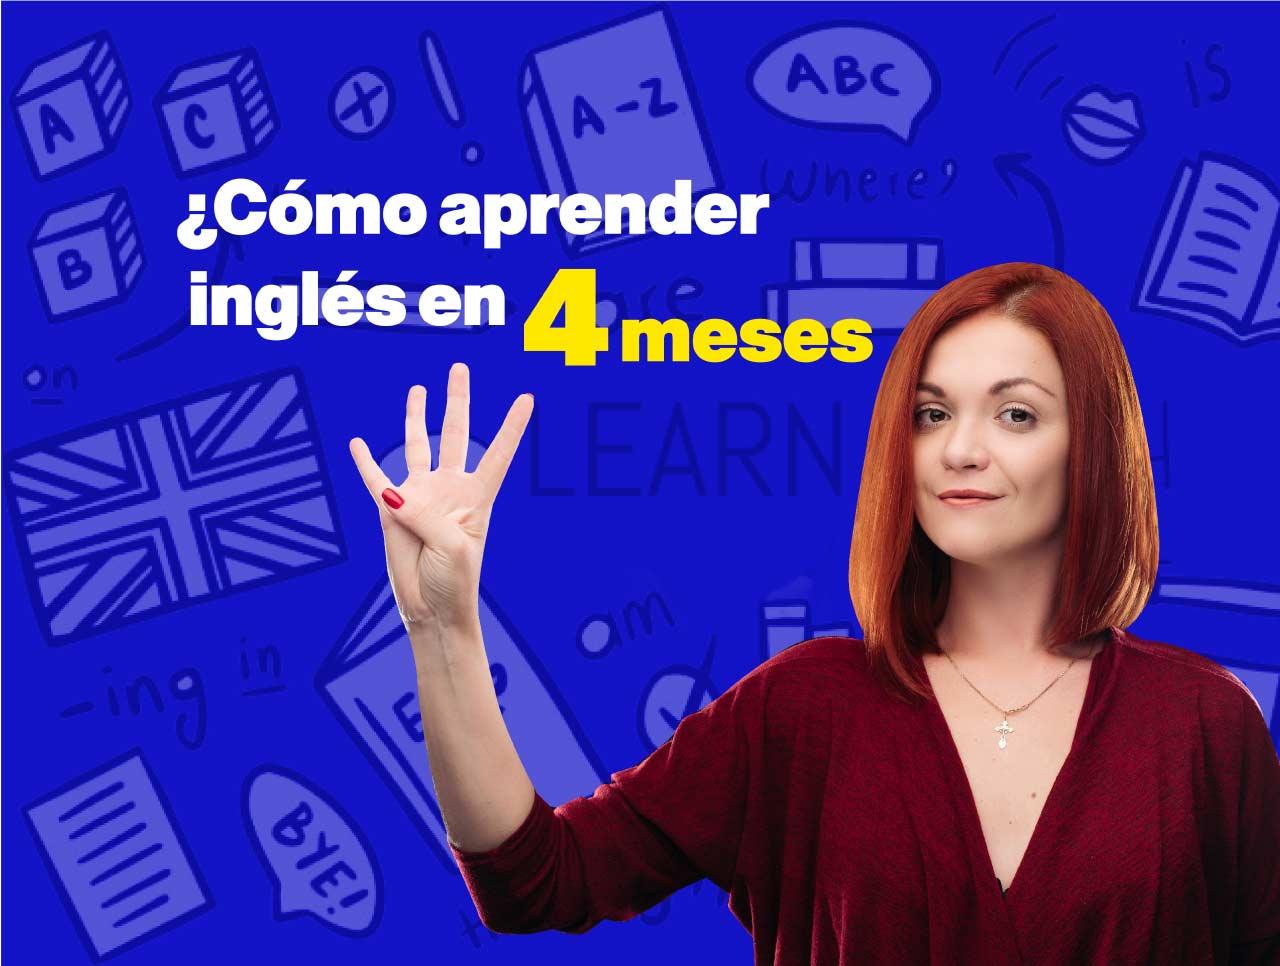 Aprender ingles rápido